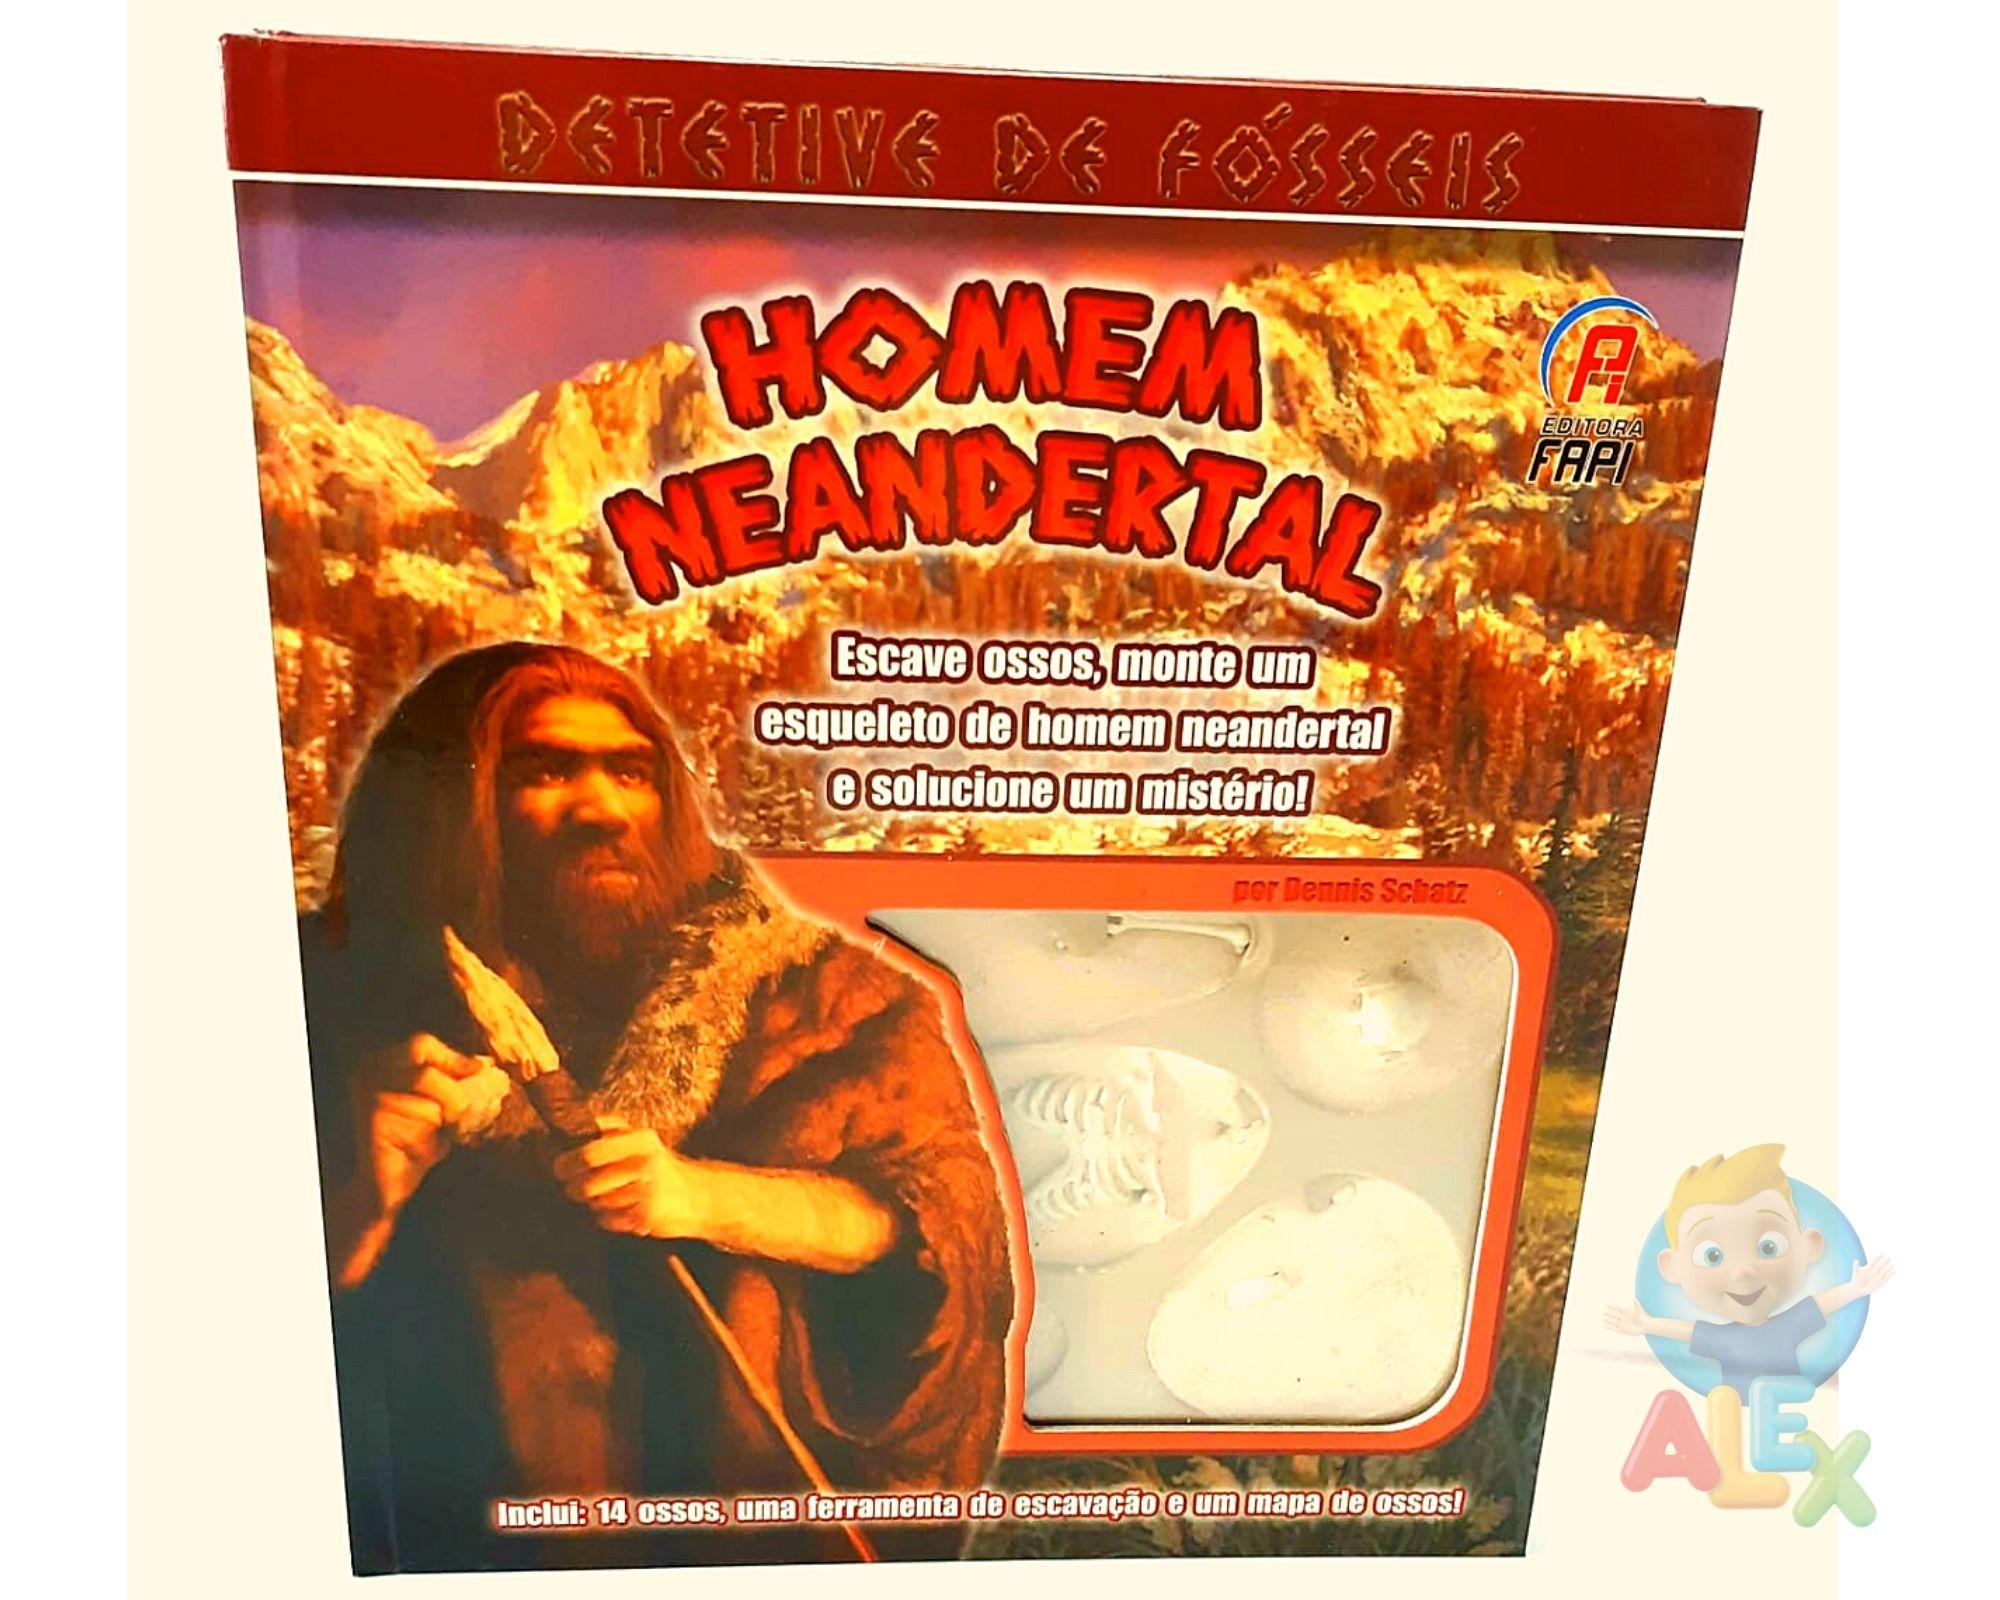 Detetive de fósseis - Homem de Neandertal